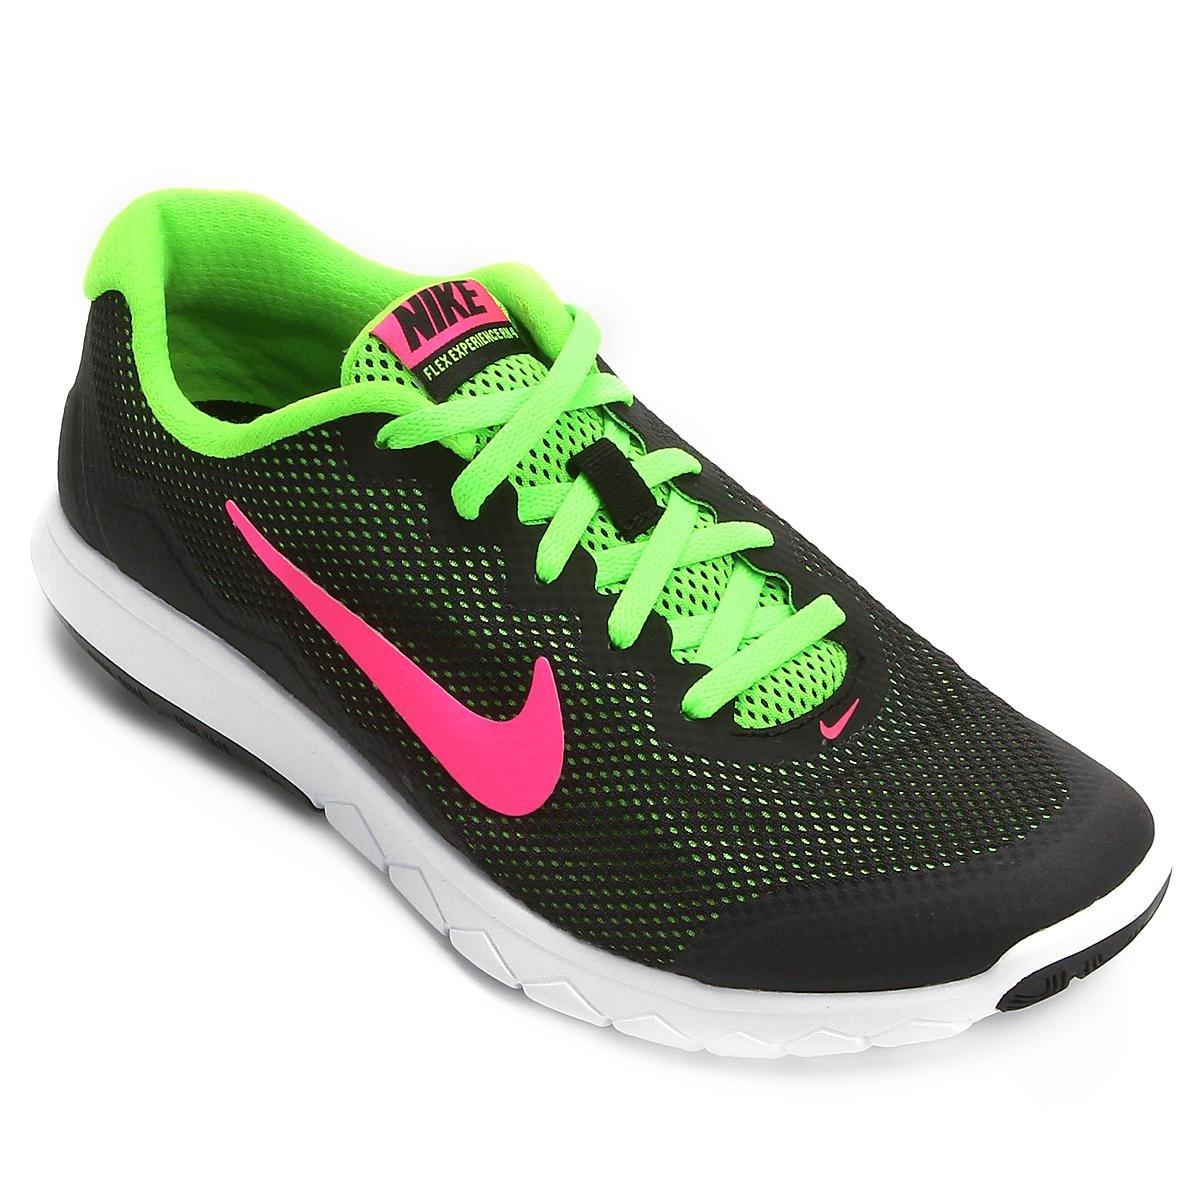 Tênis Nike Flex Experience RN 4 Feminino - Compre Agora   Netshoes ea9f34144e